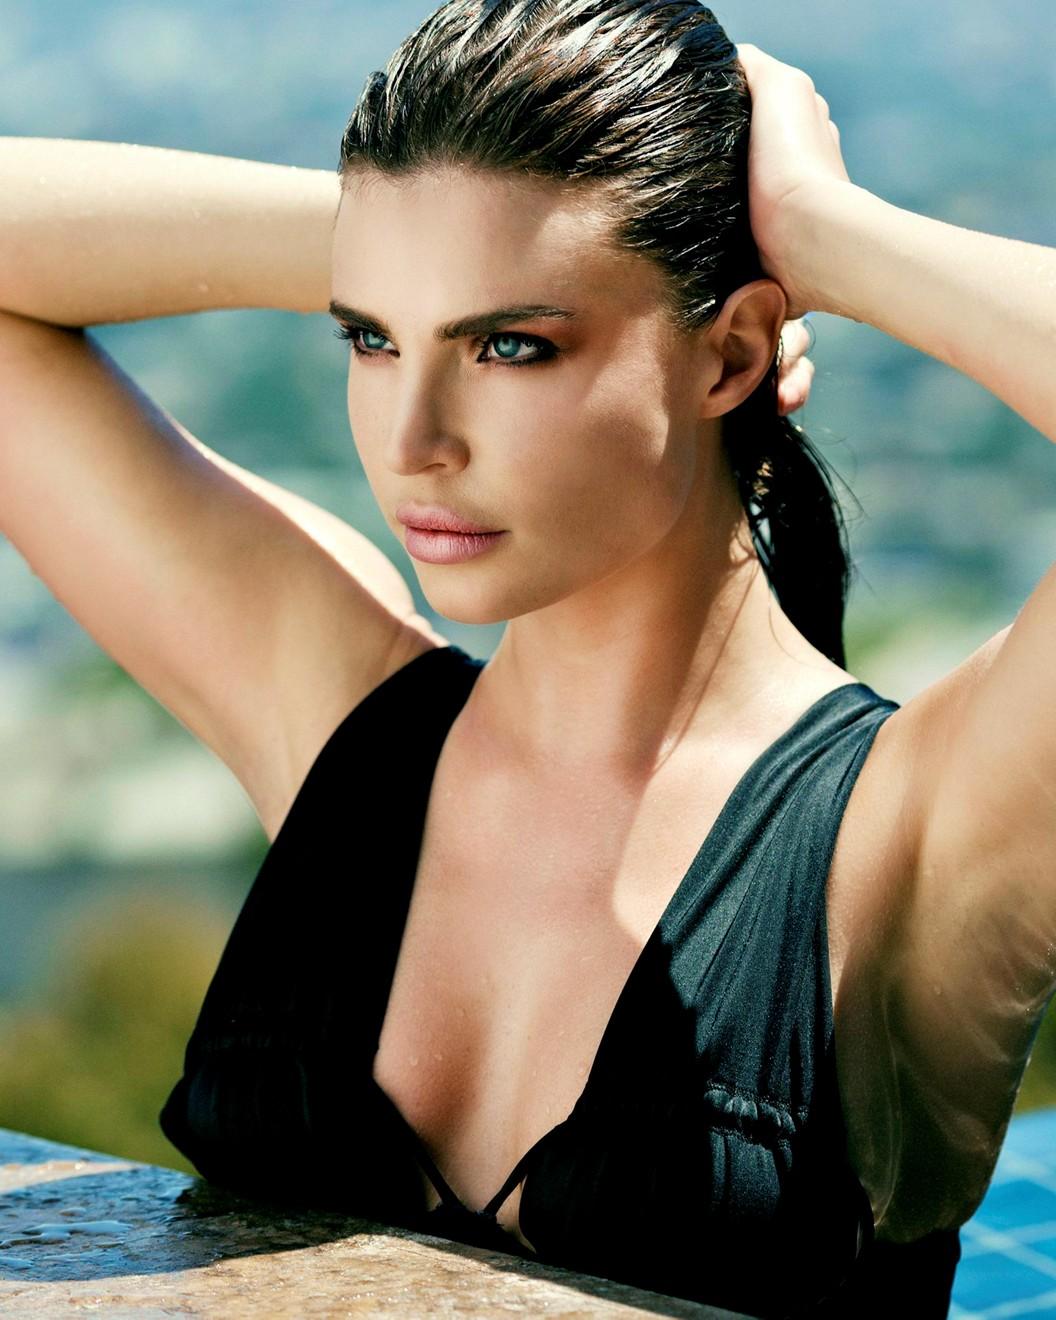 Julia Lescova, face, headshot, red hot